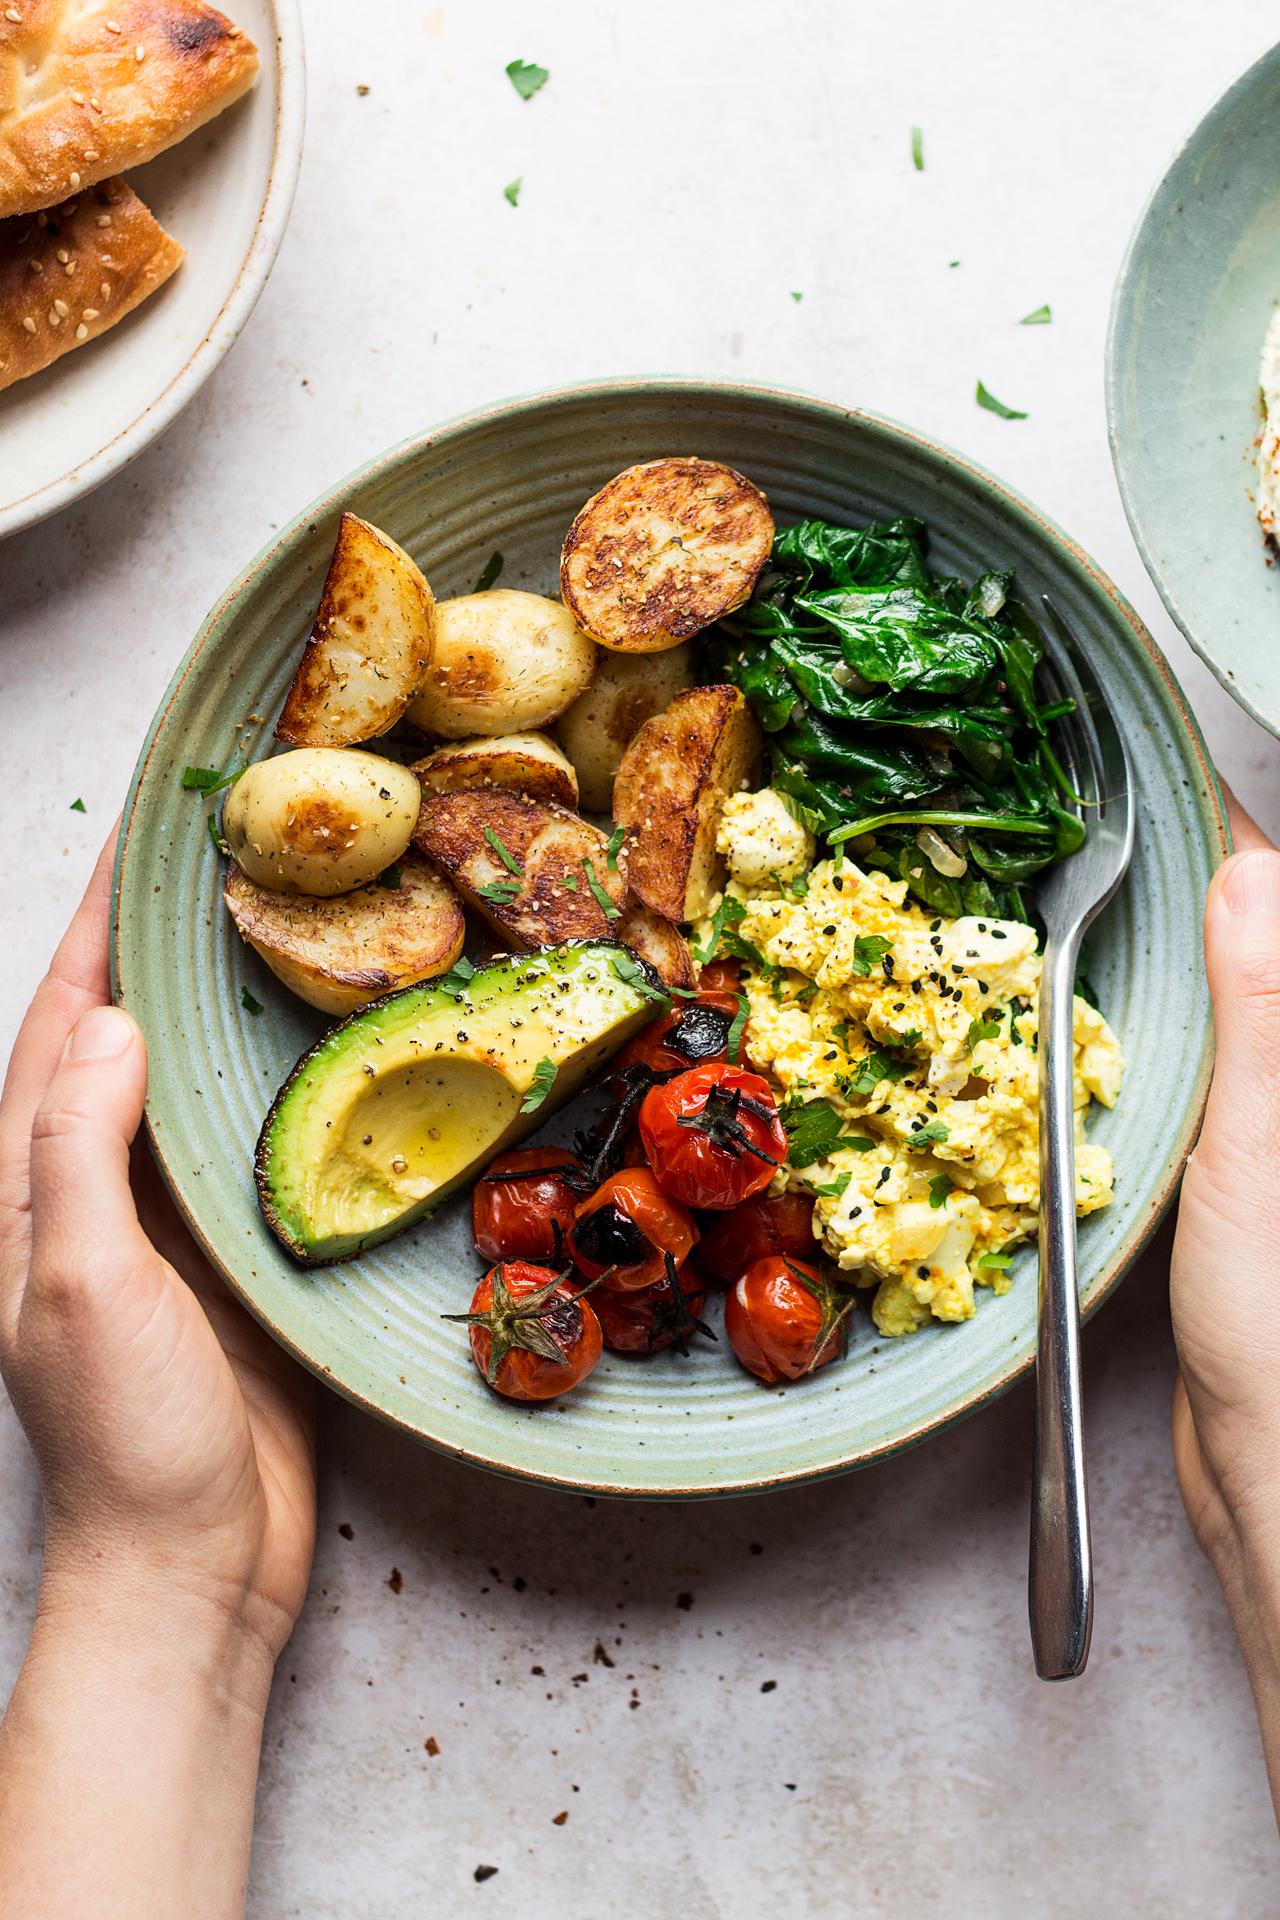 Savoury Vegan Breakfast Bowl Lazy Cat Kitchen